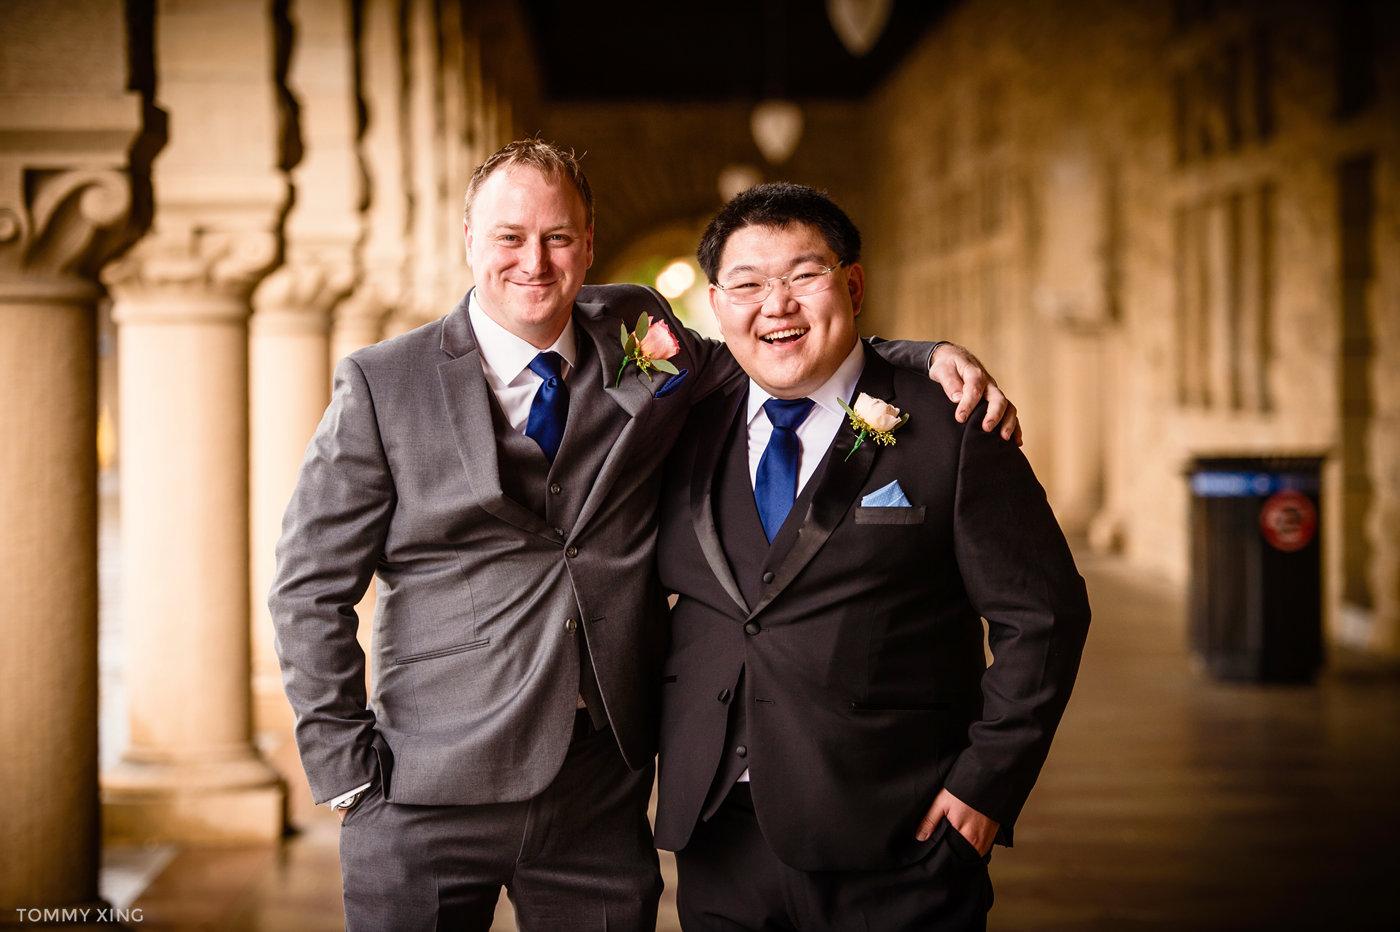 STANFORD MEMORIAL CHURCH WEDDING - Wenjie & Chengcheng - SAN FRANCISCO BAY AREA 斯坦福教堂婚礼跟拍 - 洛杉矶婚礼婚纱照摄影师 Tommy Xing Photography142.jpg